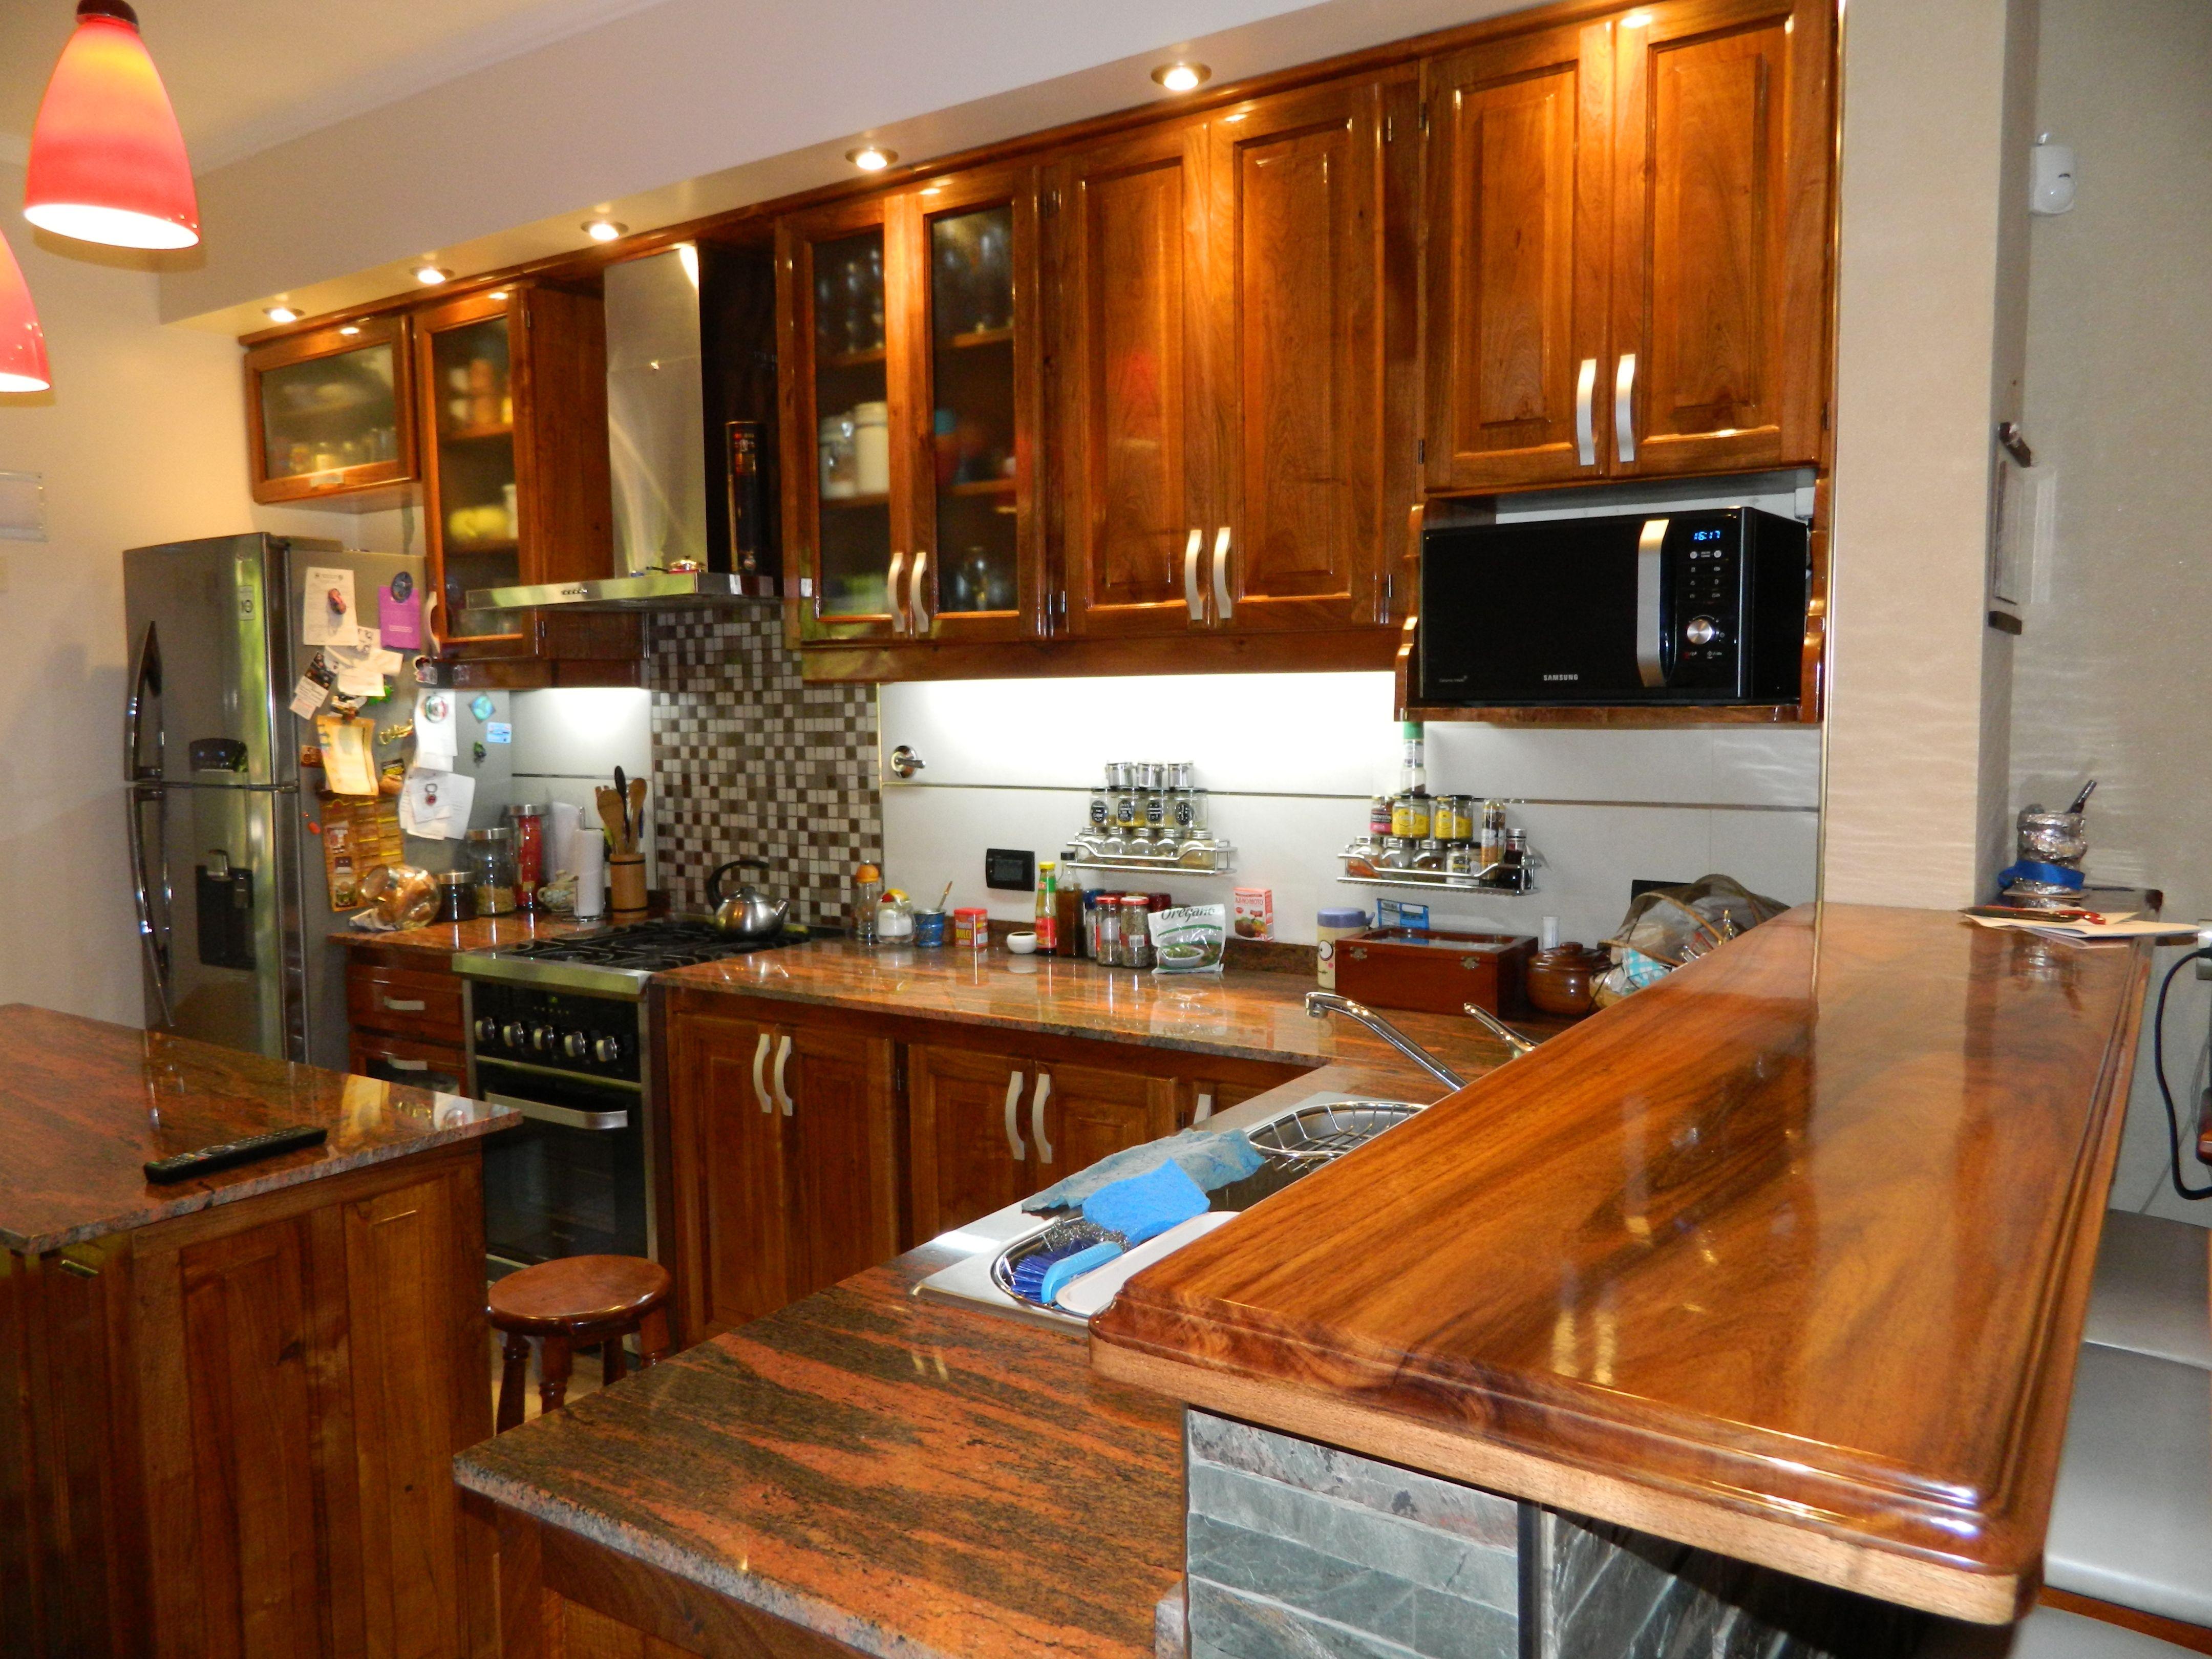 Muebles de cocina, laqueados o encerados, eternos, modernos ...